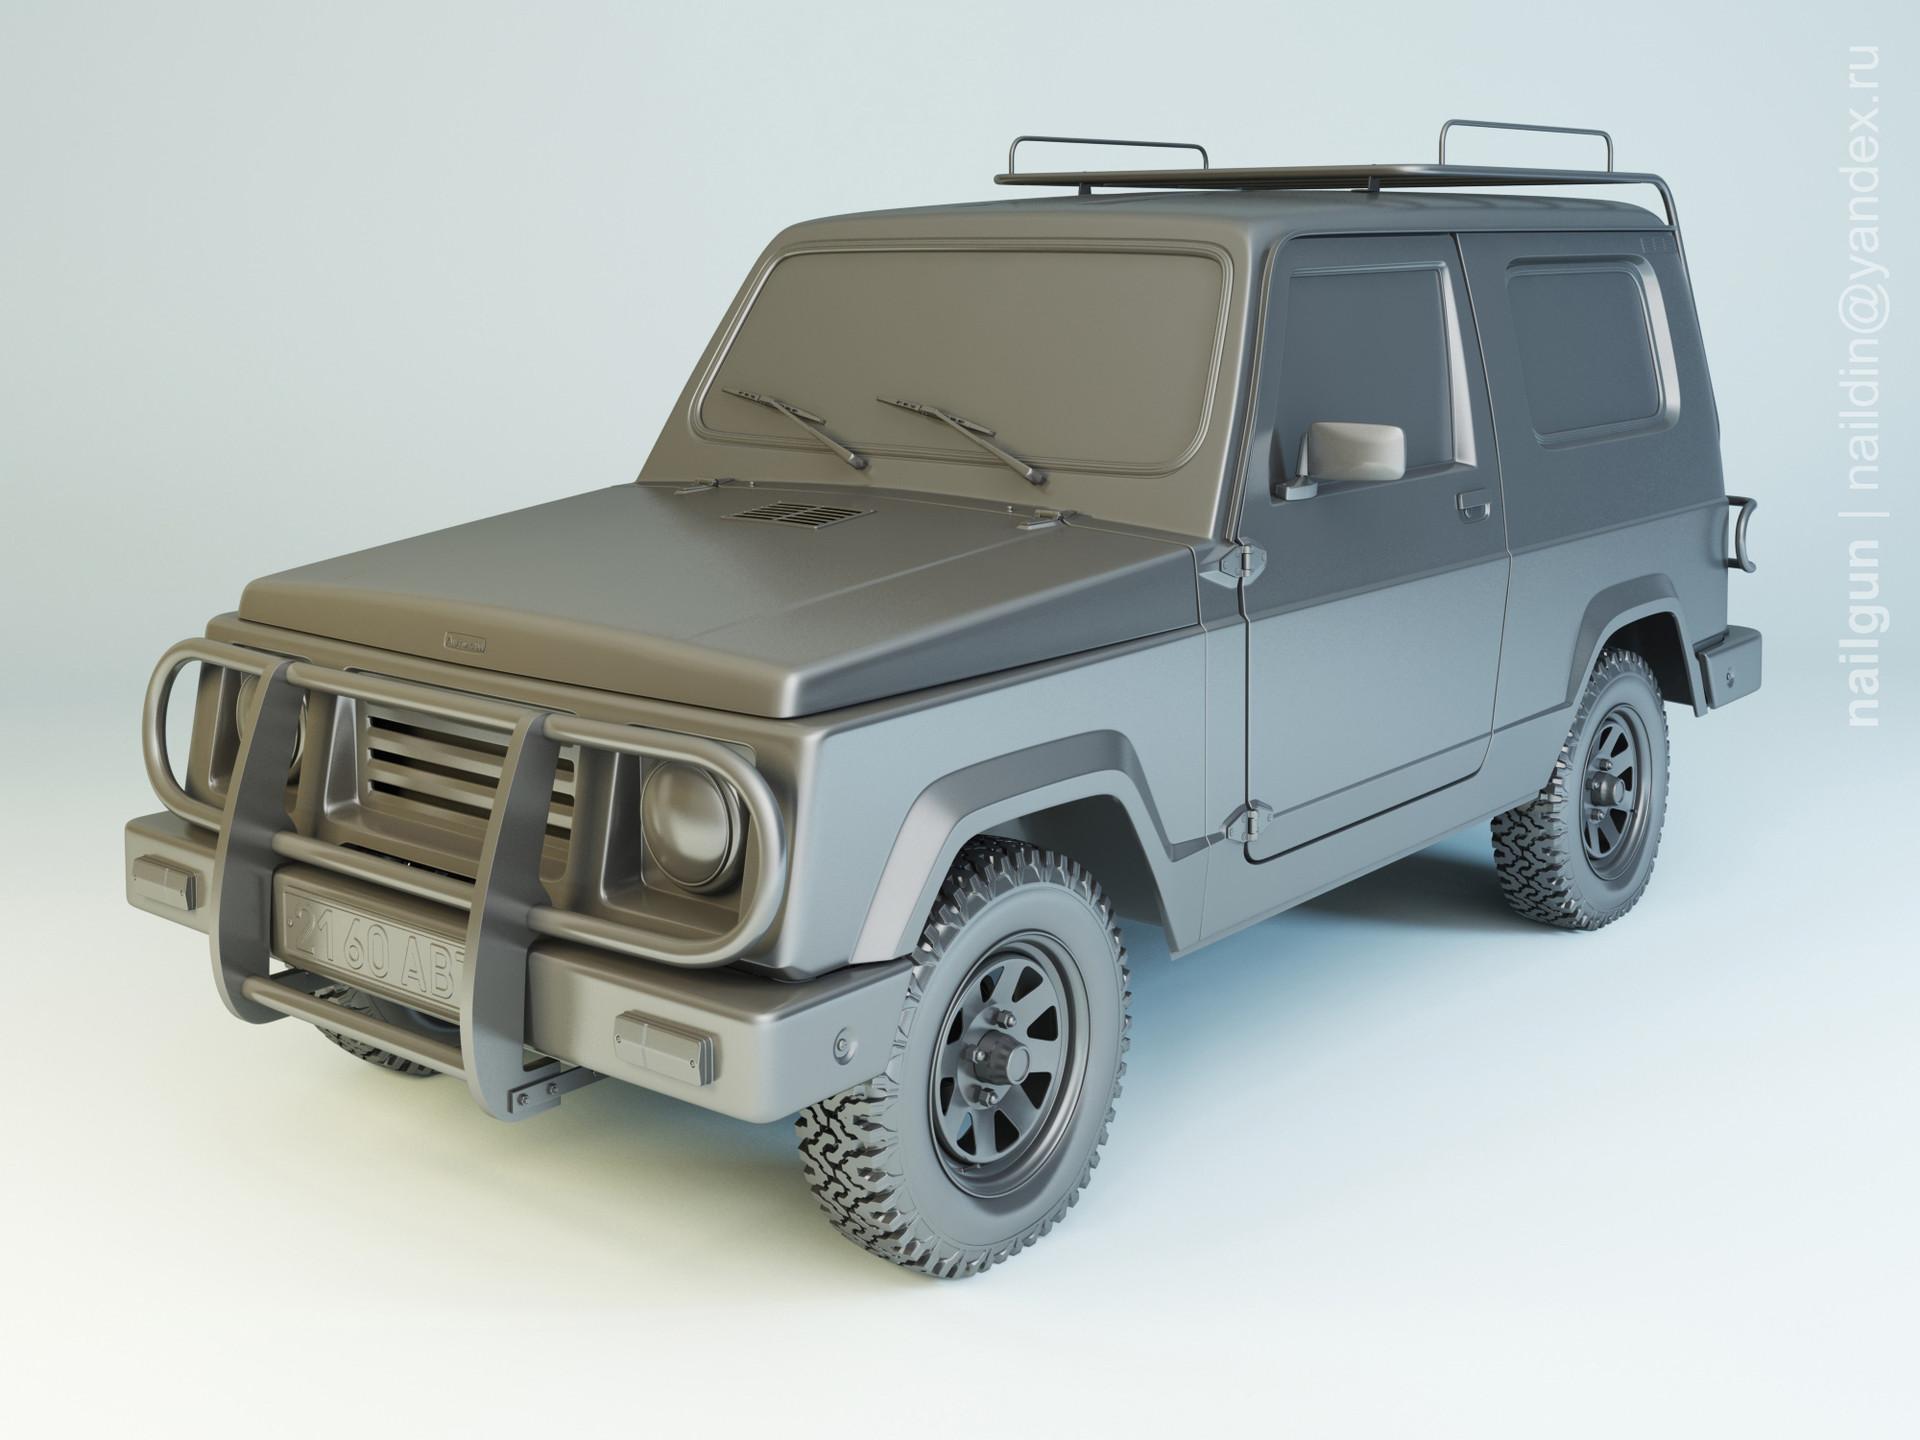 Nail khusnutdinov al 138 002 autokam ranger modelling 0